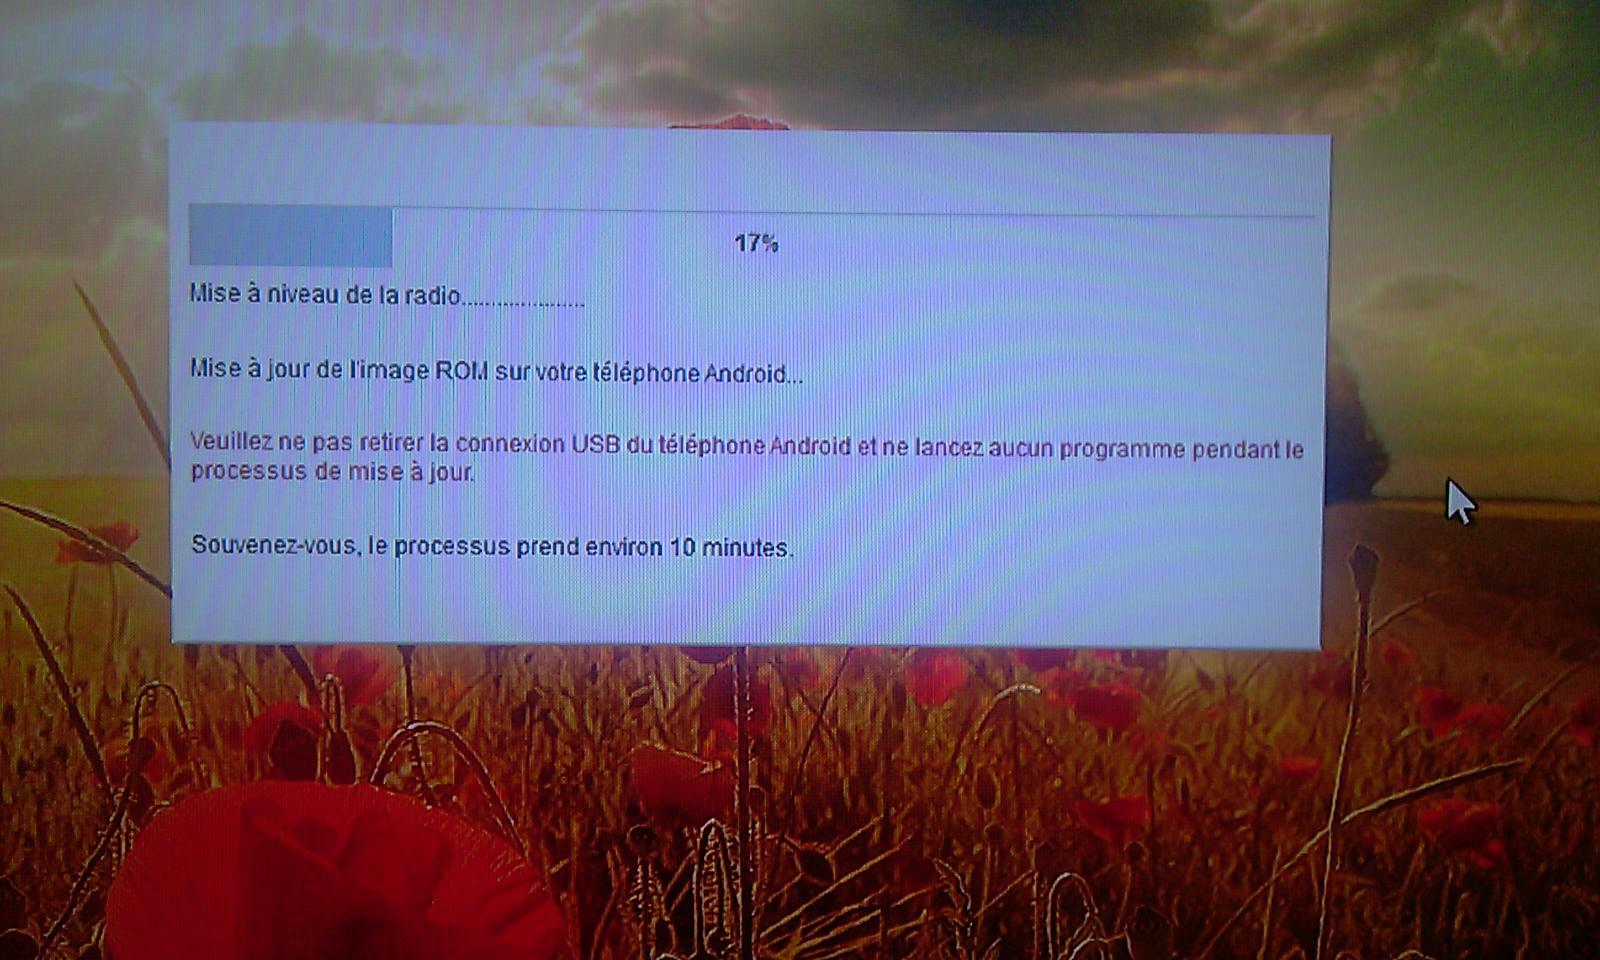 [Tuto] Downgrade vers GB, passage en S.Off, installation Leedroid GB 2.2.0 (en images) 320393DowngradeHC13